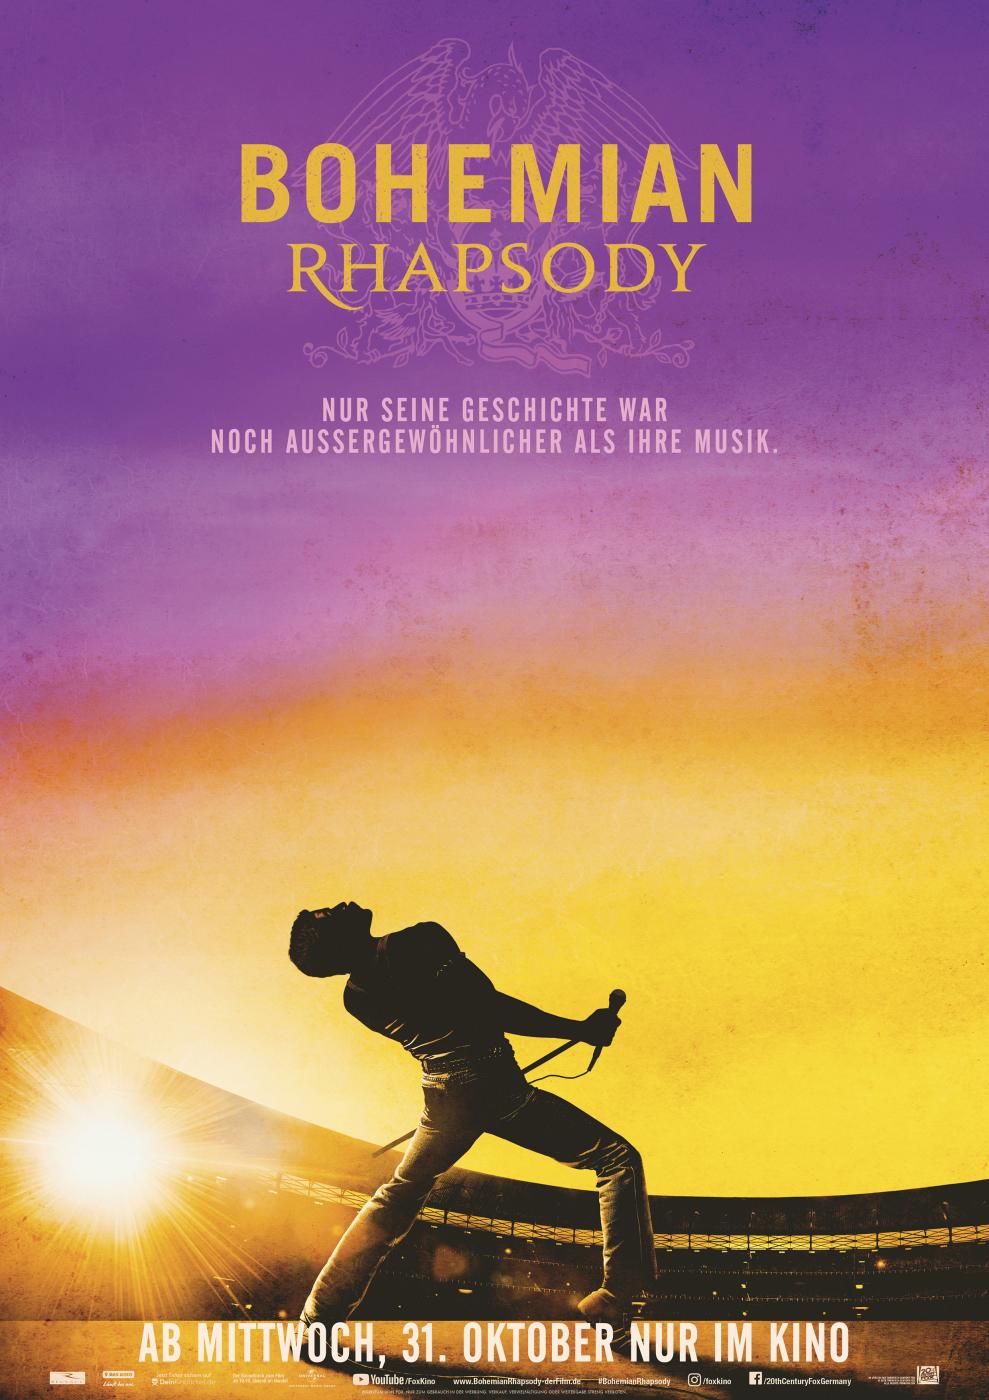 https://www.fbw-filmbewertung.com/uploads/fbwdb_film/poster/2dfb0e1553dcb423b7c665c33ef3543c4360bbc0.jpg